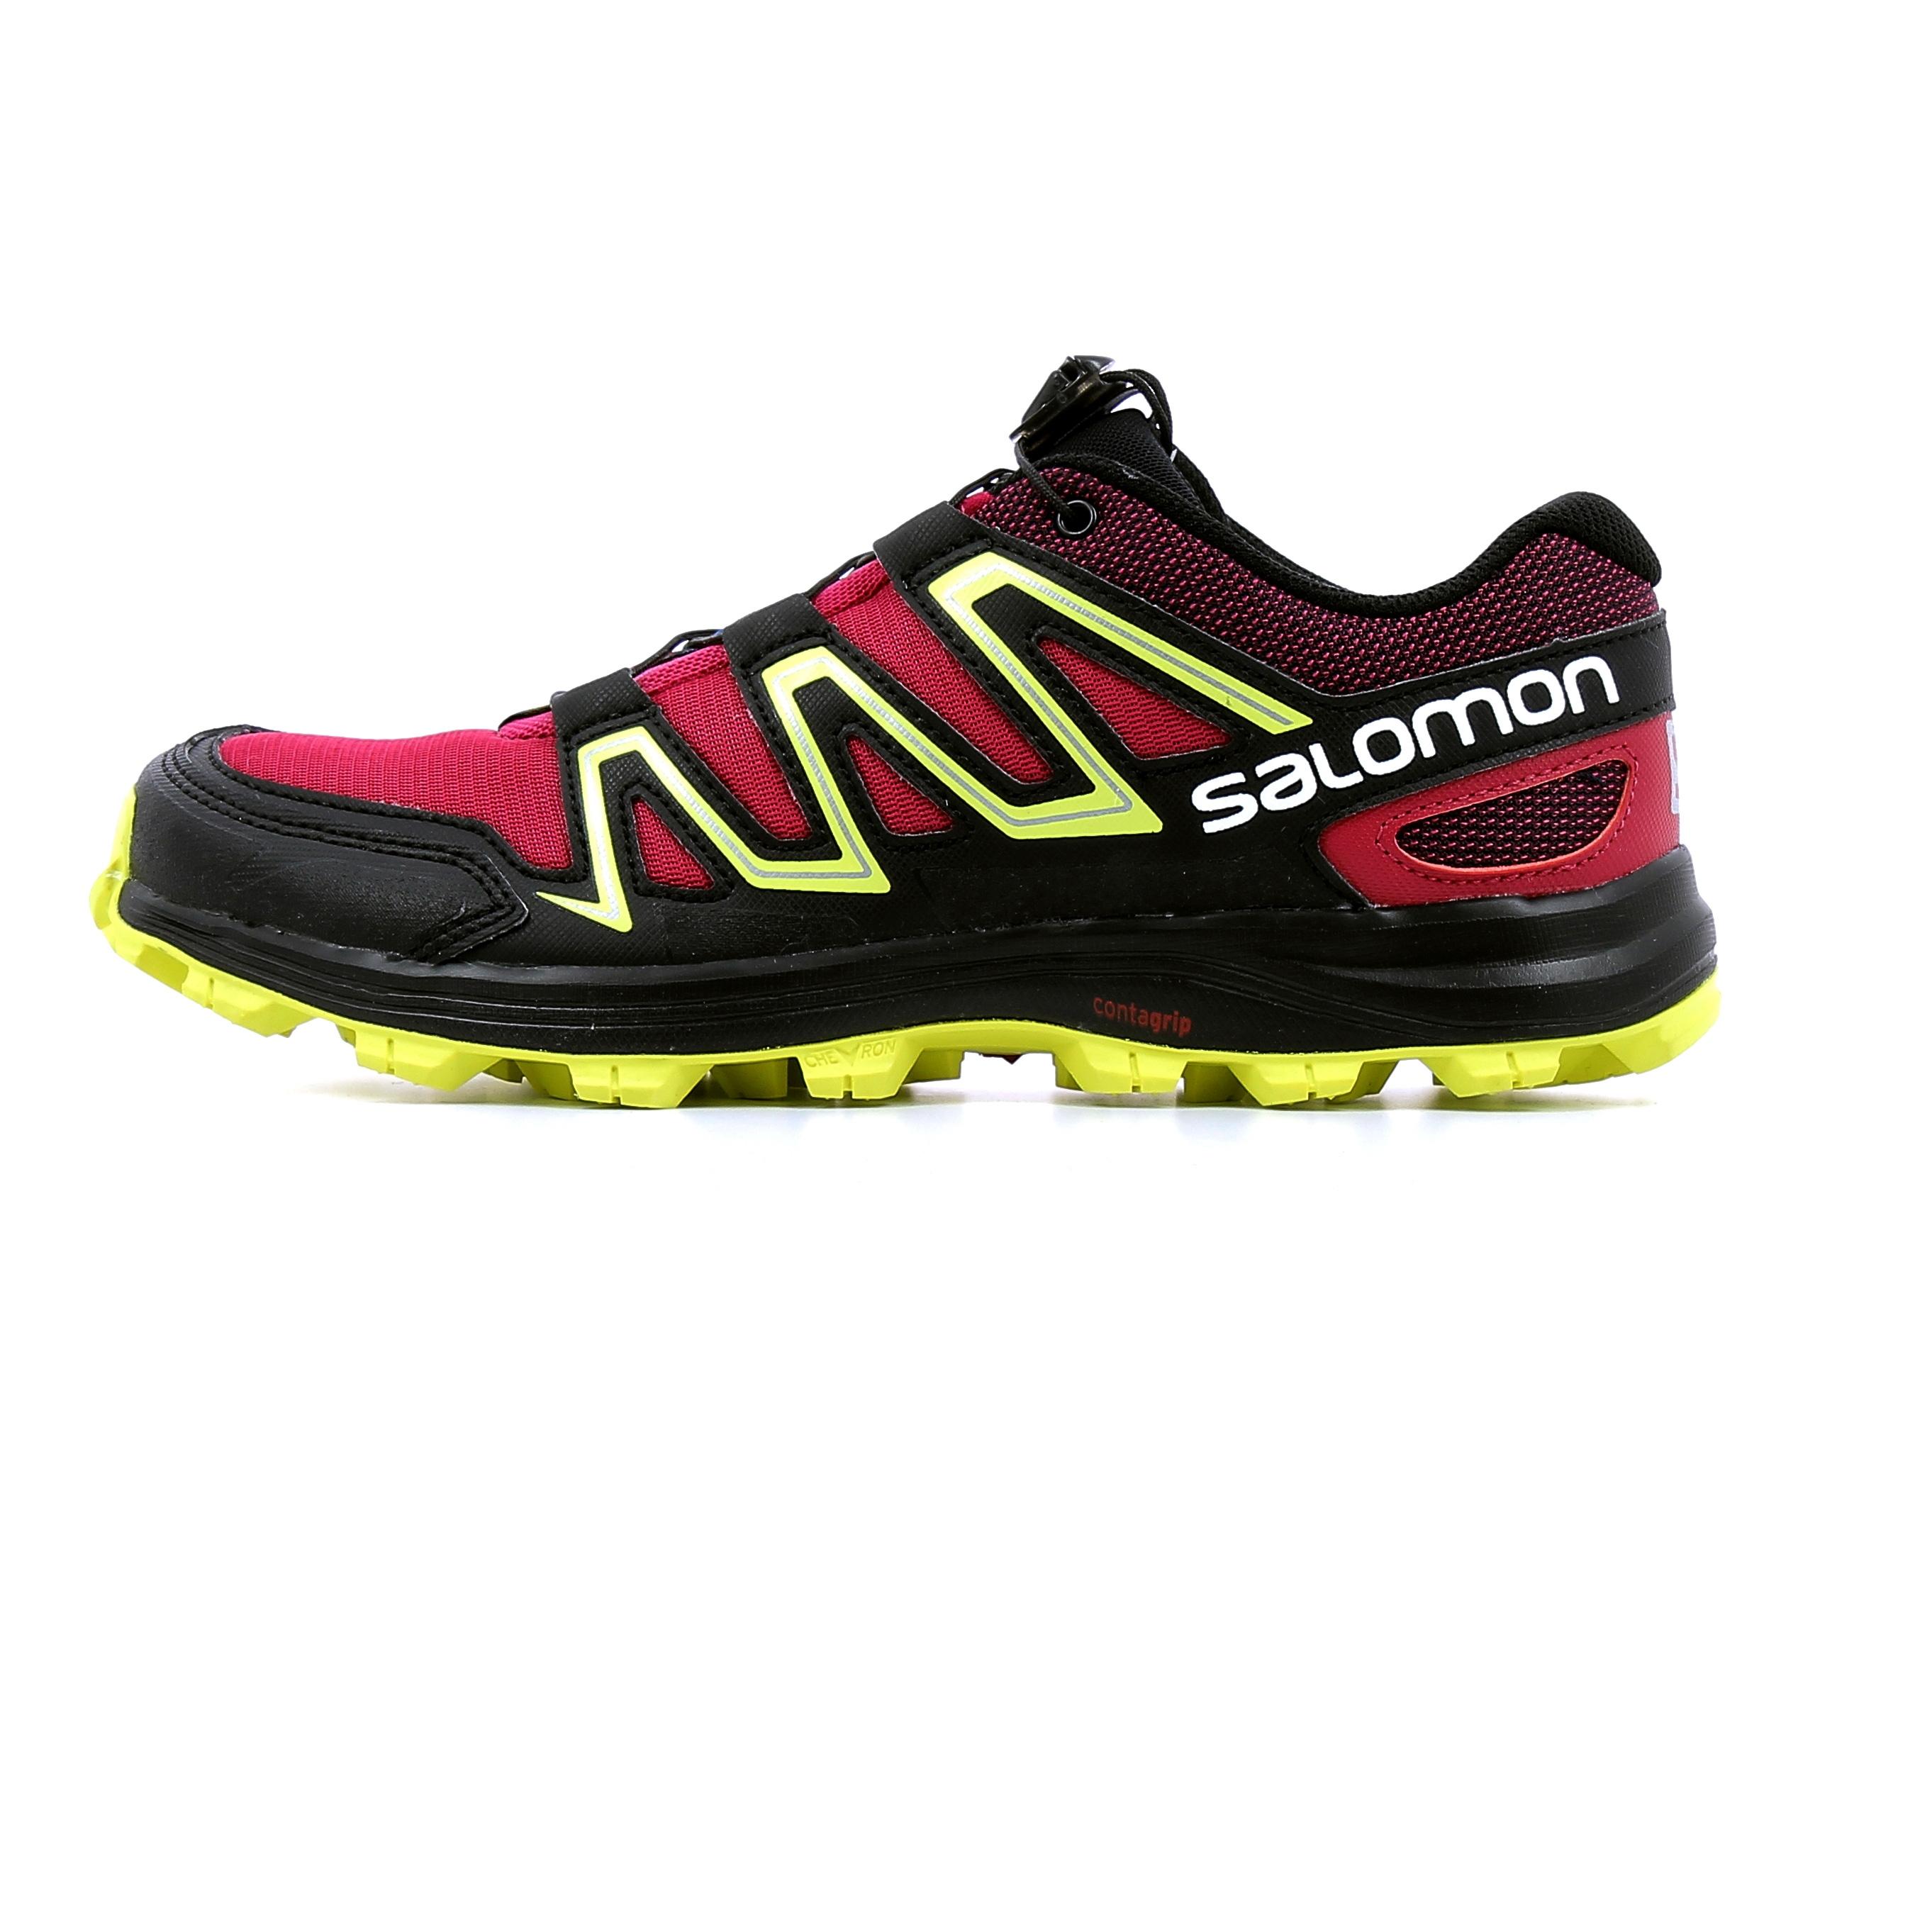 promo code dce12 86b97 Chaussure de trail femme Salomon Speedtrak W